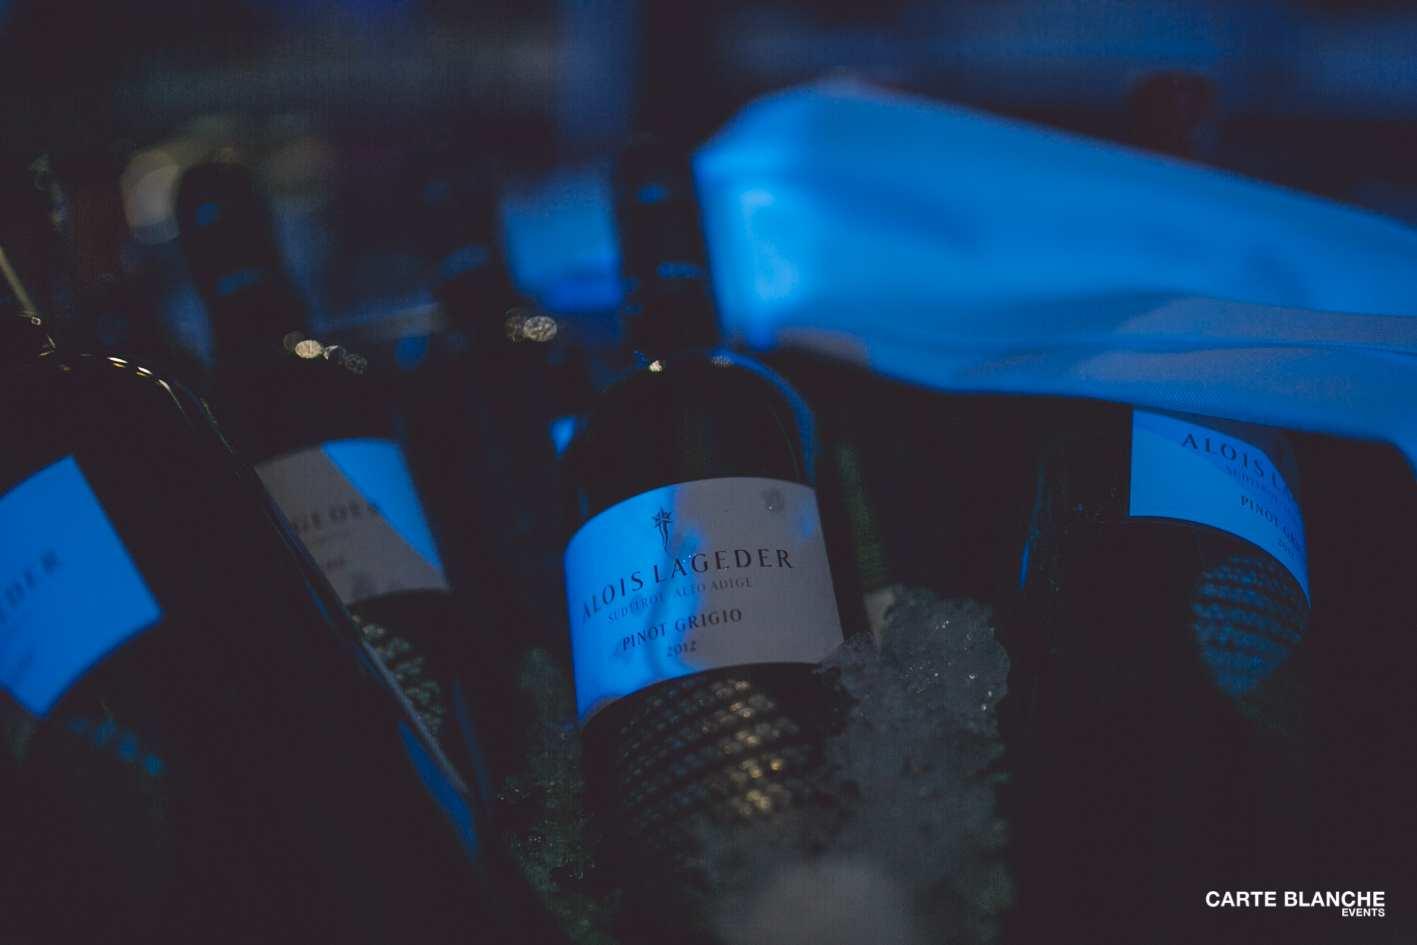 xmas-party-ferrero-2013-vin-boisson-luxembourg-events